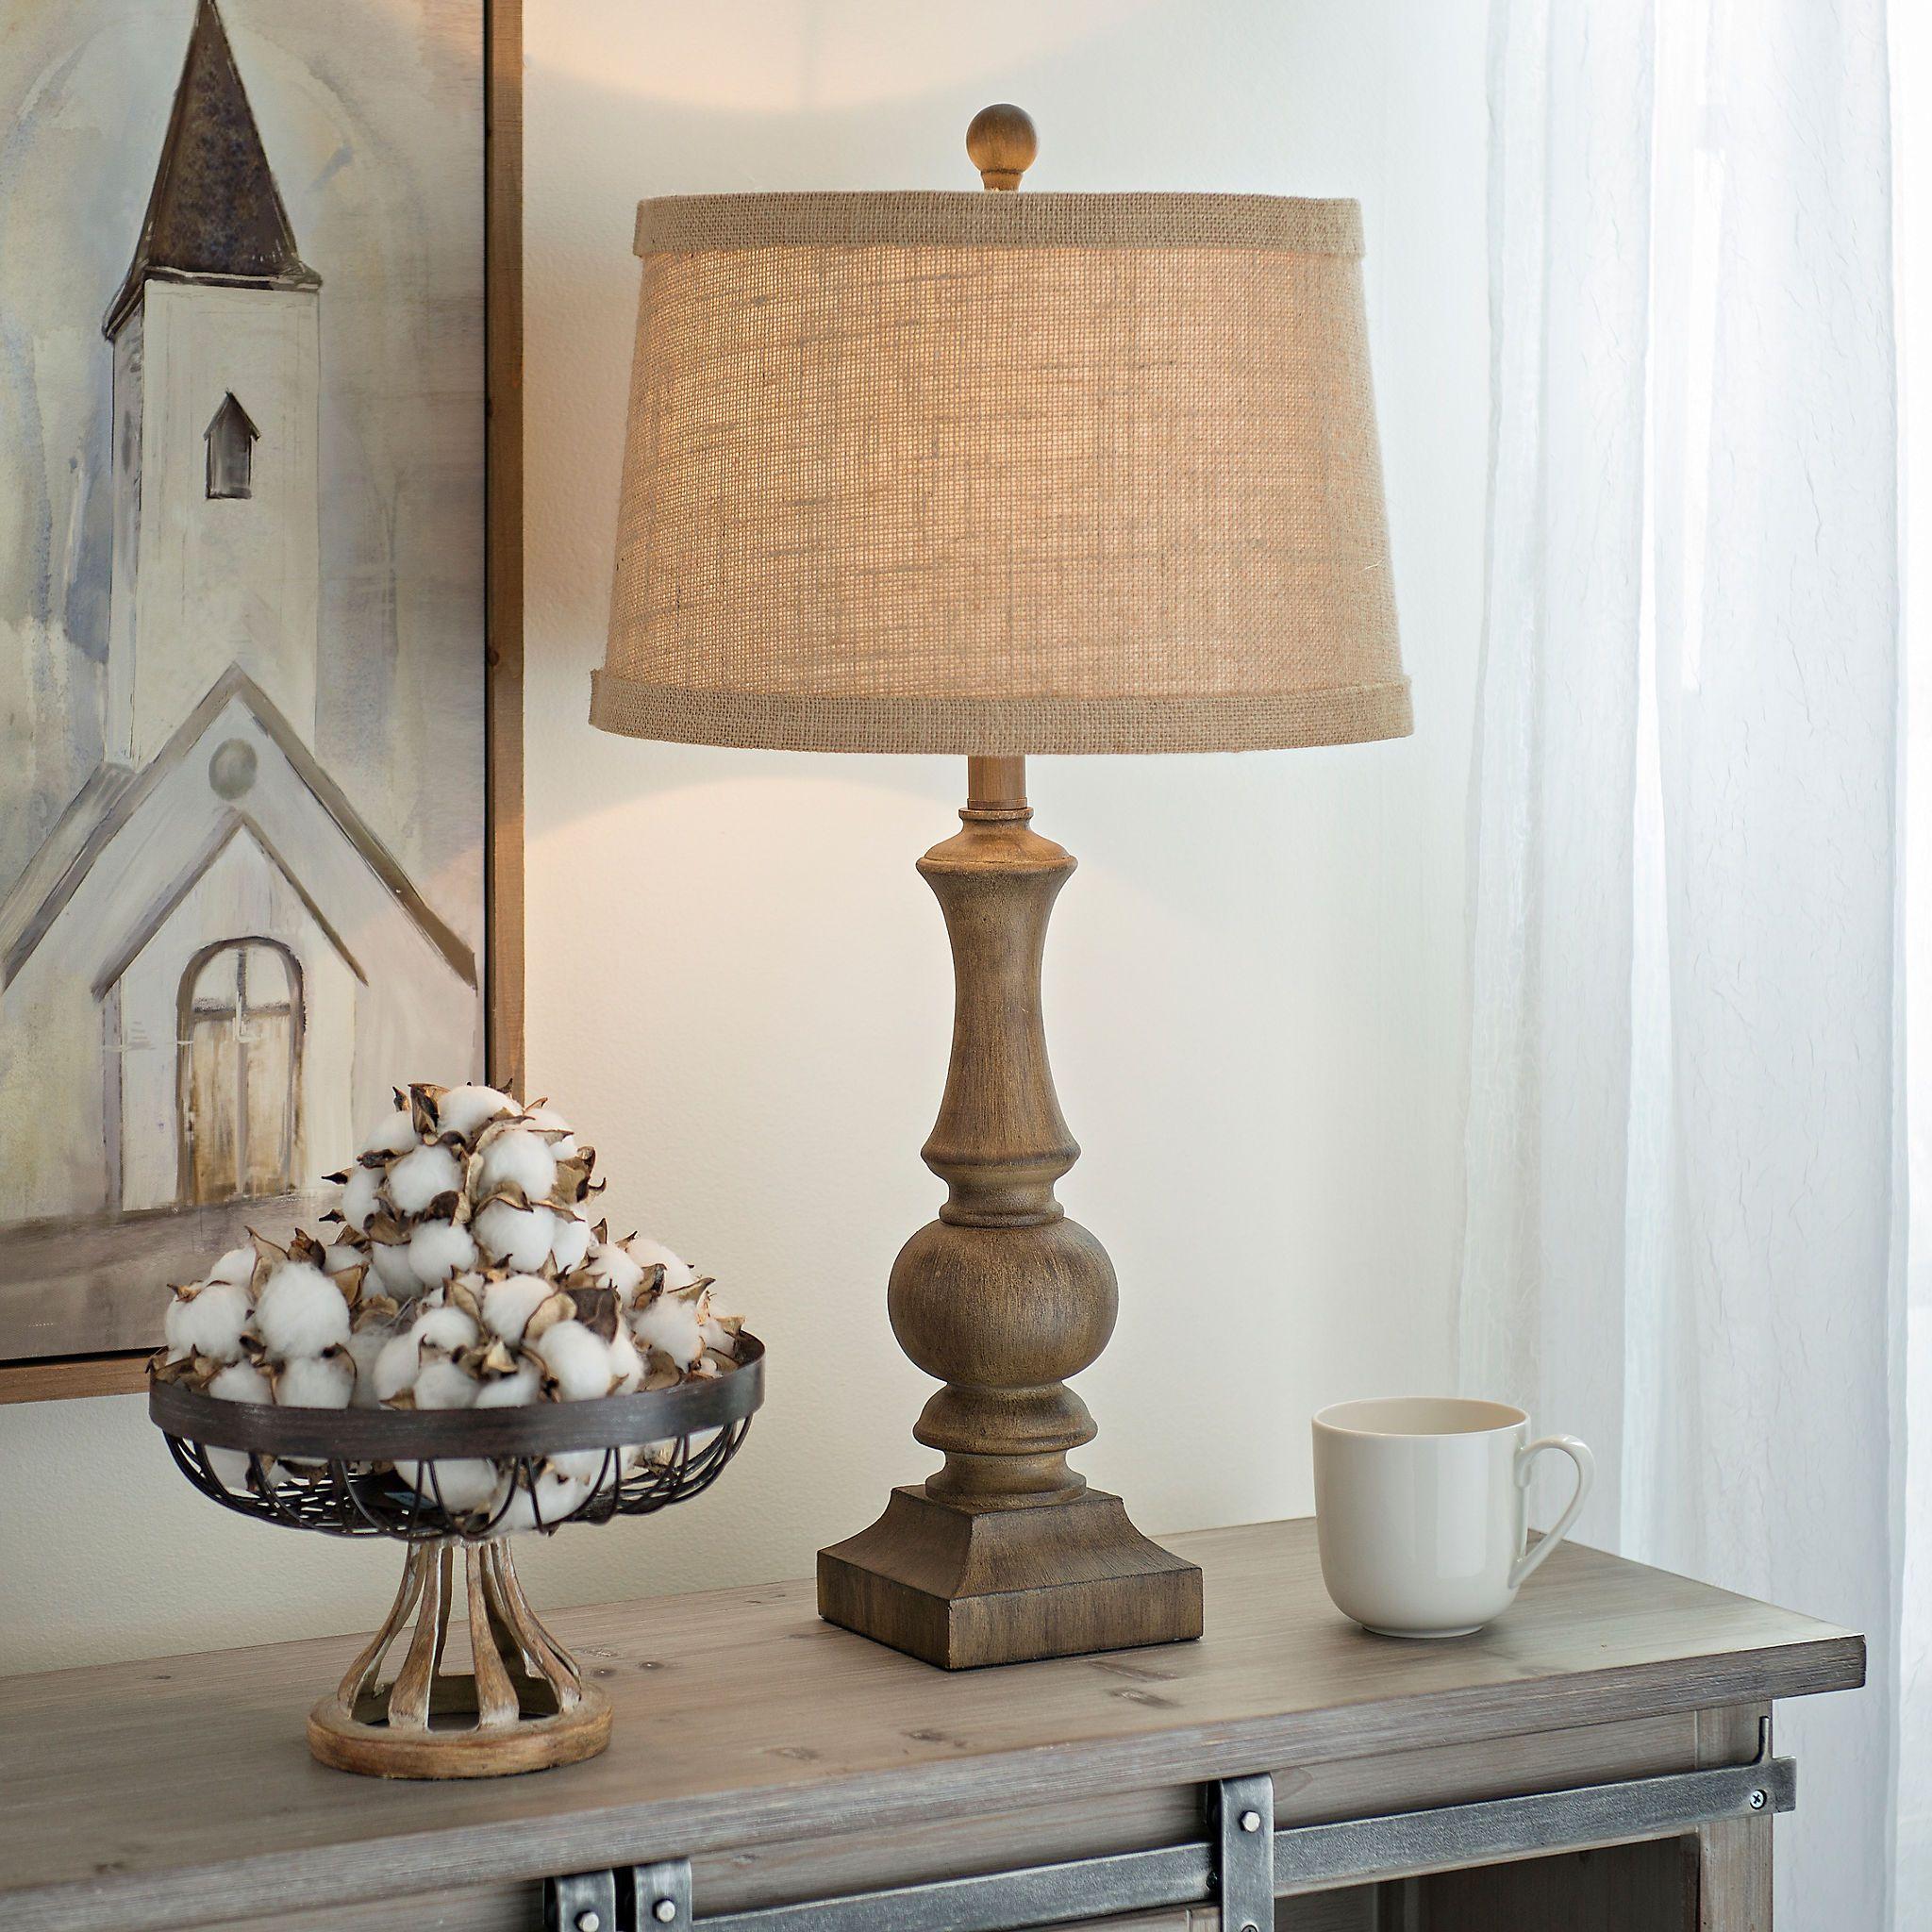 Woodgrain Table Lamp Table lamp wood, Farmhouse table